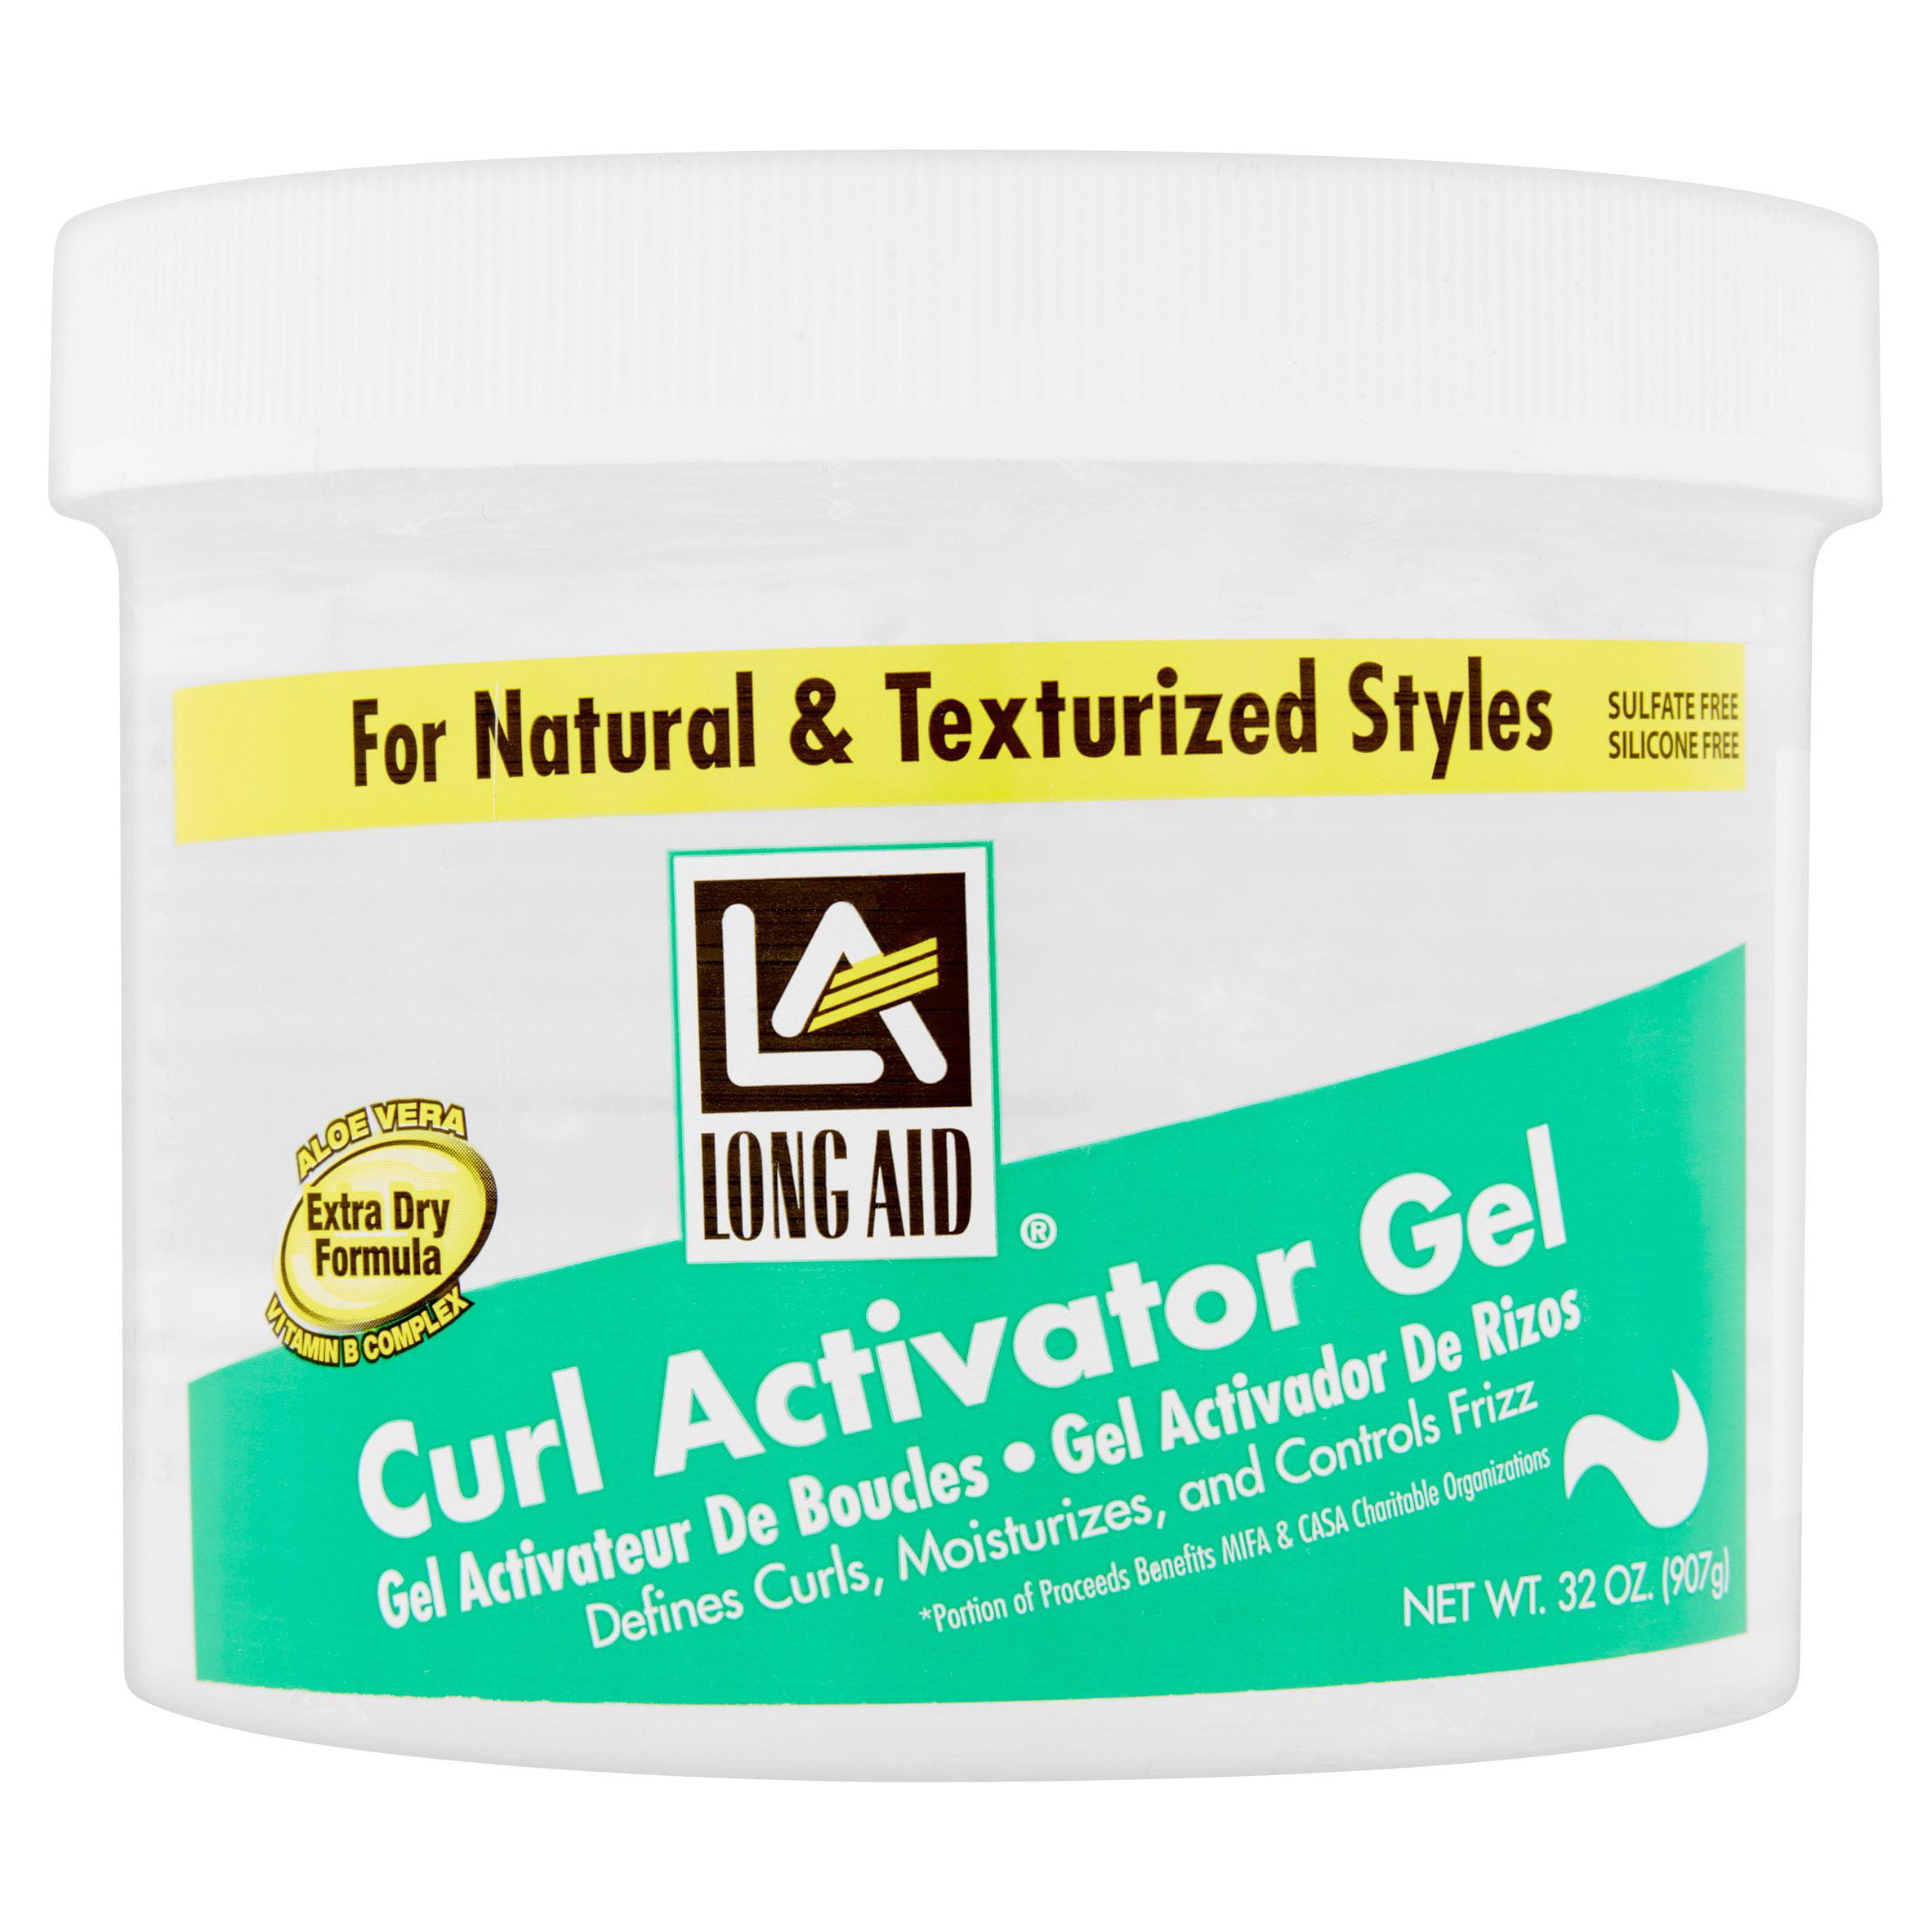 Long Aid® Extra Dry Formula Curl Activator Gel 11 oz. Jar ...